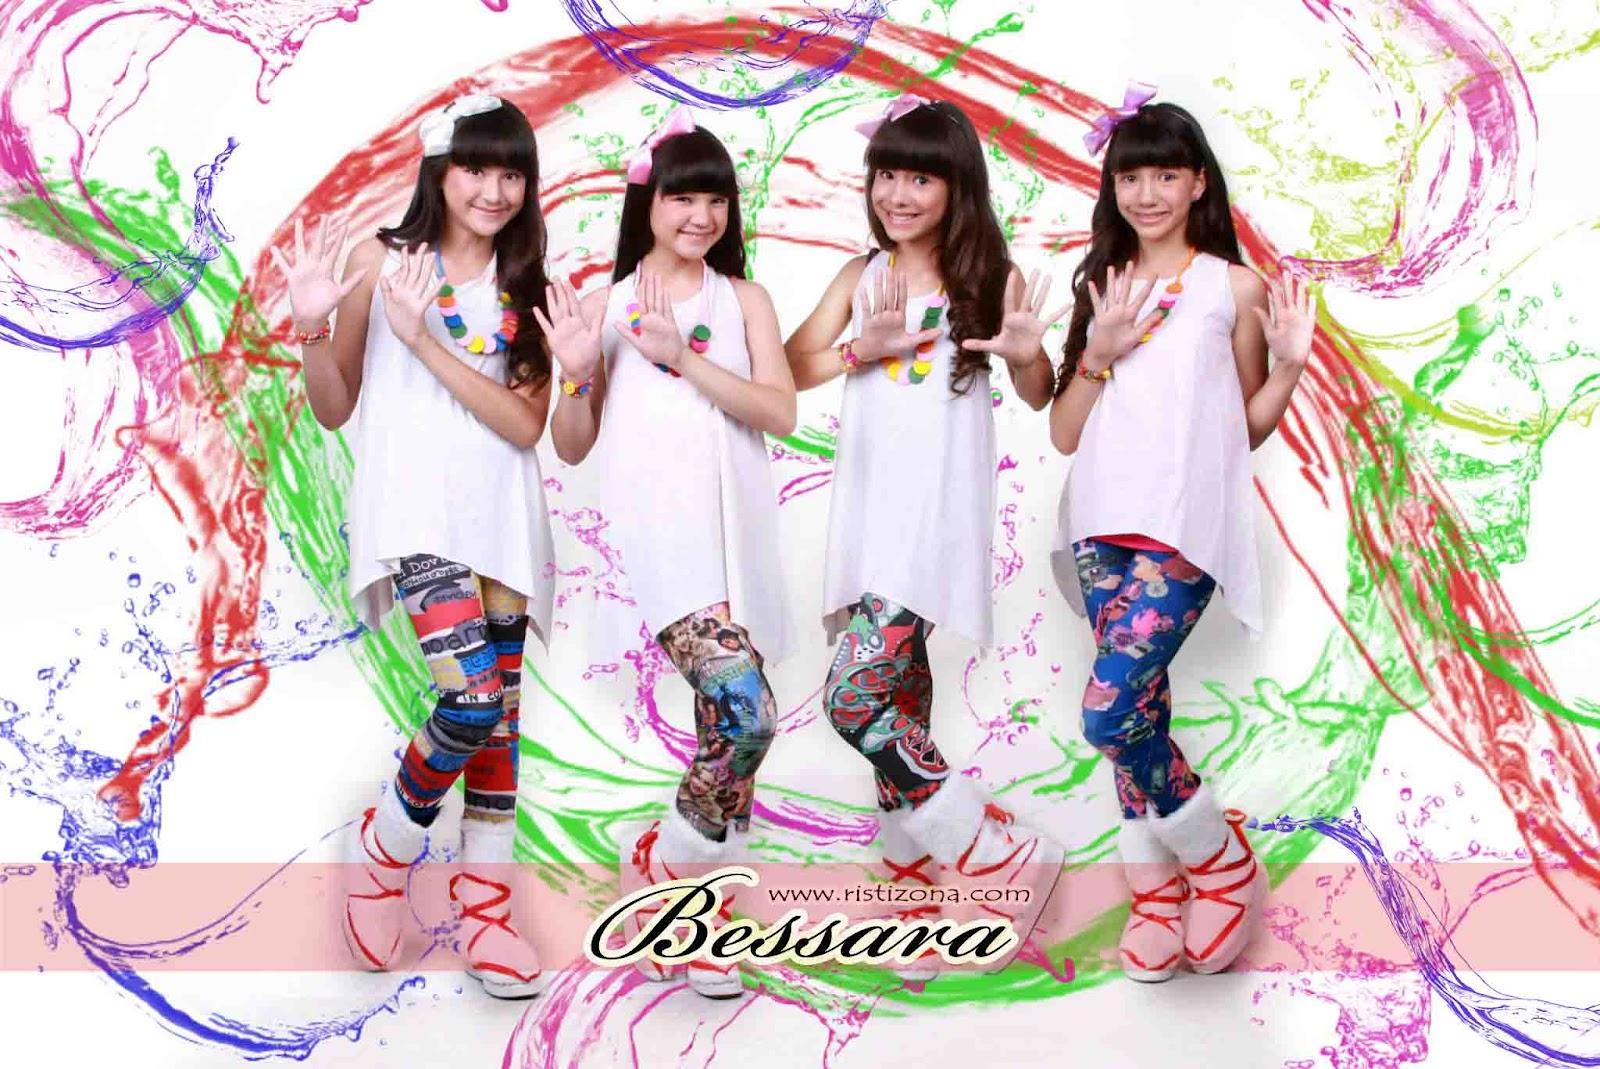 Kumpulan Foto Bessara Girlband Terbaru 2012